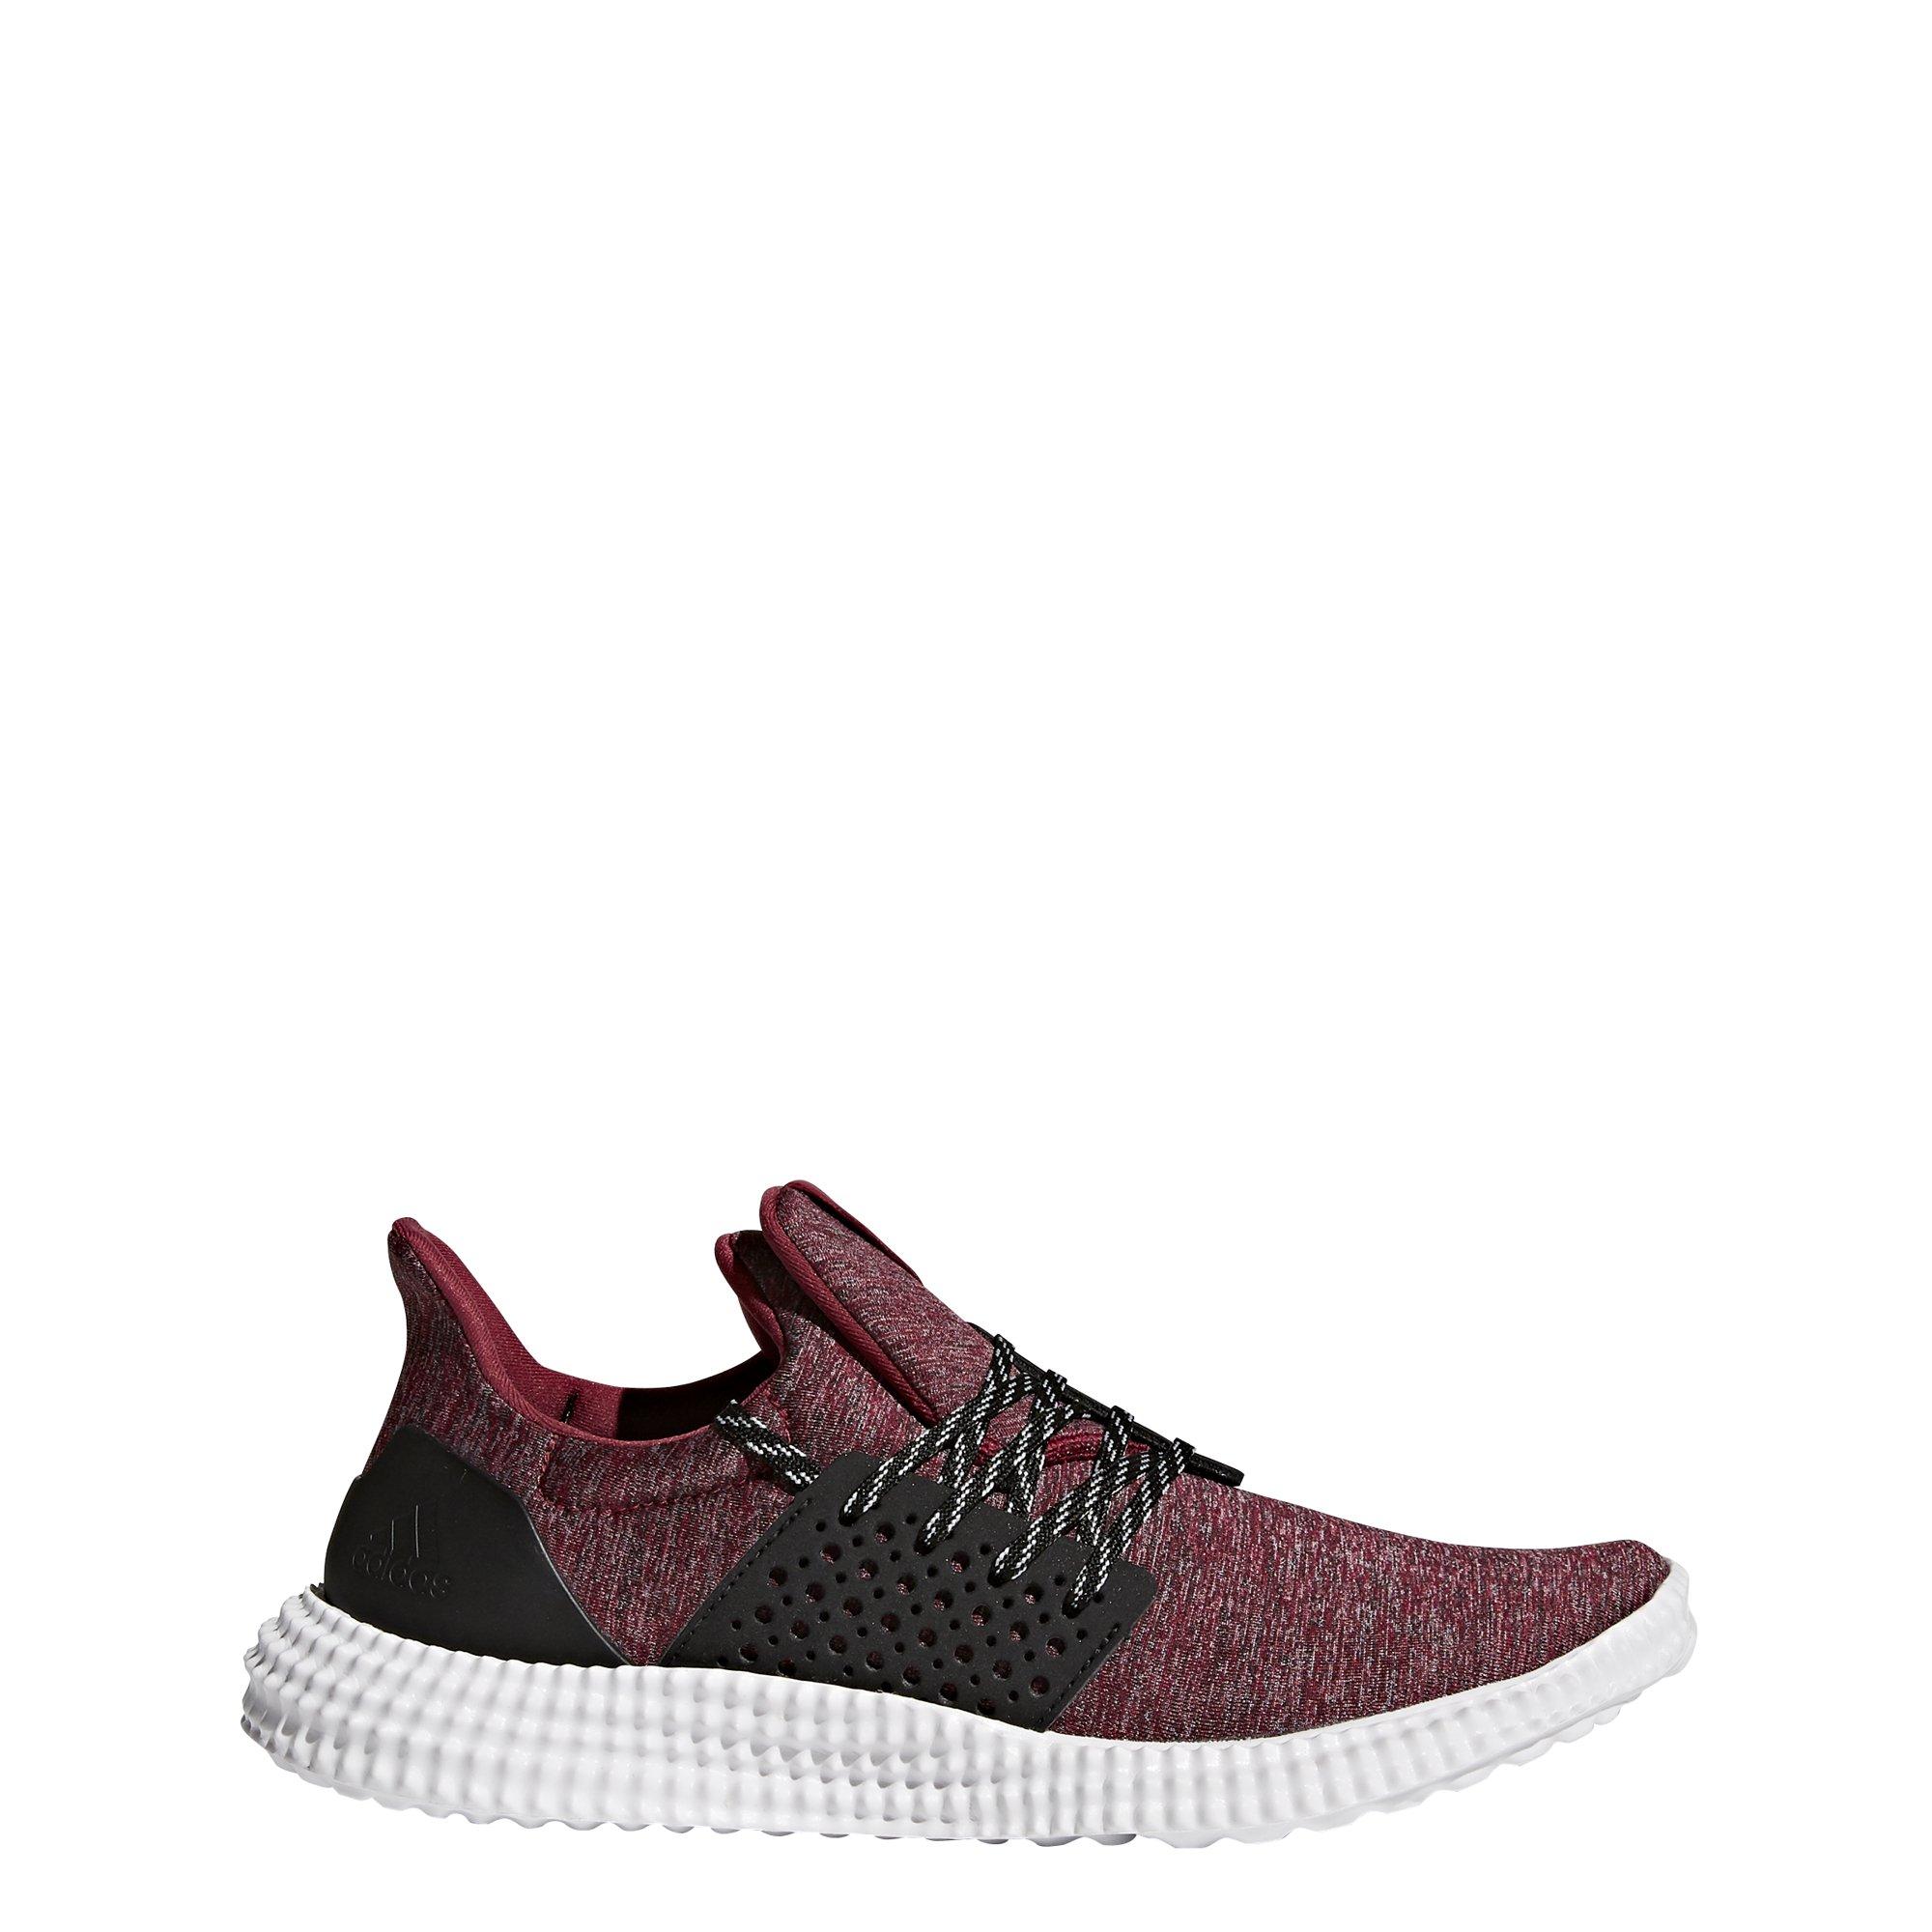 adidas Women's Shoes | Athletics 24/7 Training, Mystery Ruby/Black/White, (7.5 M US)